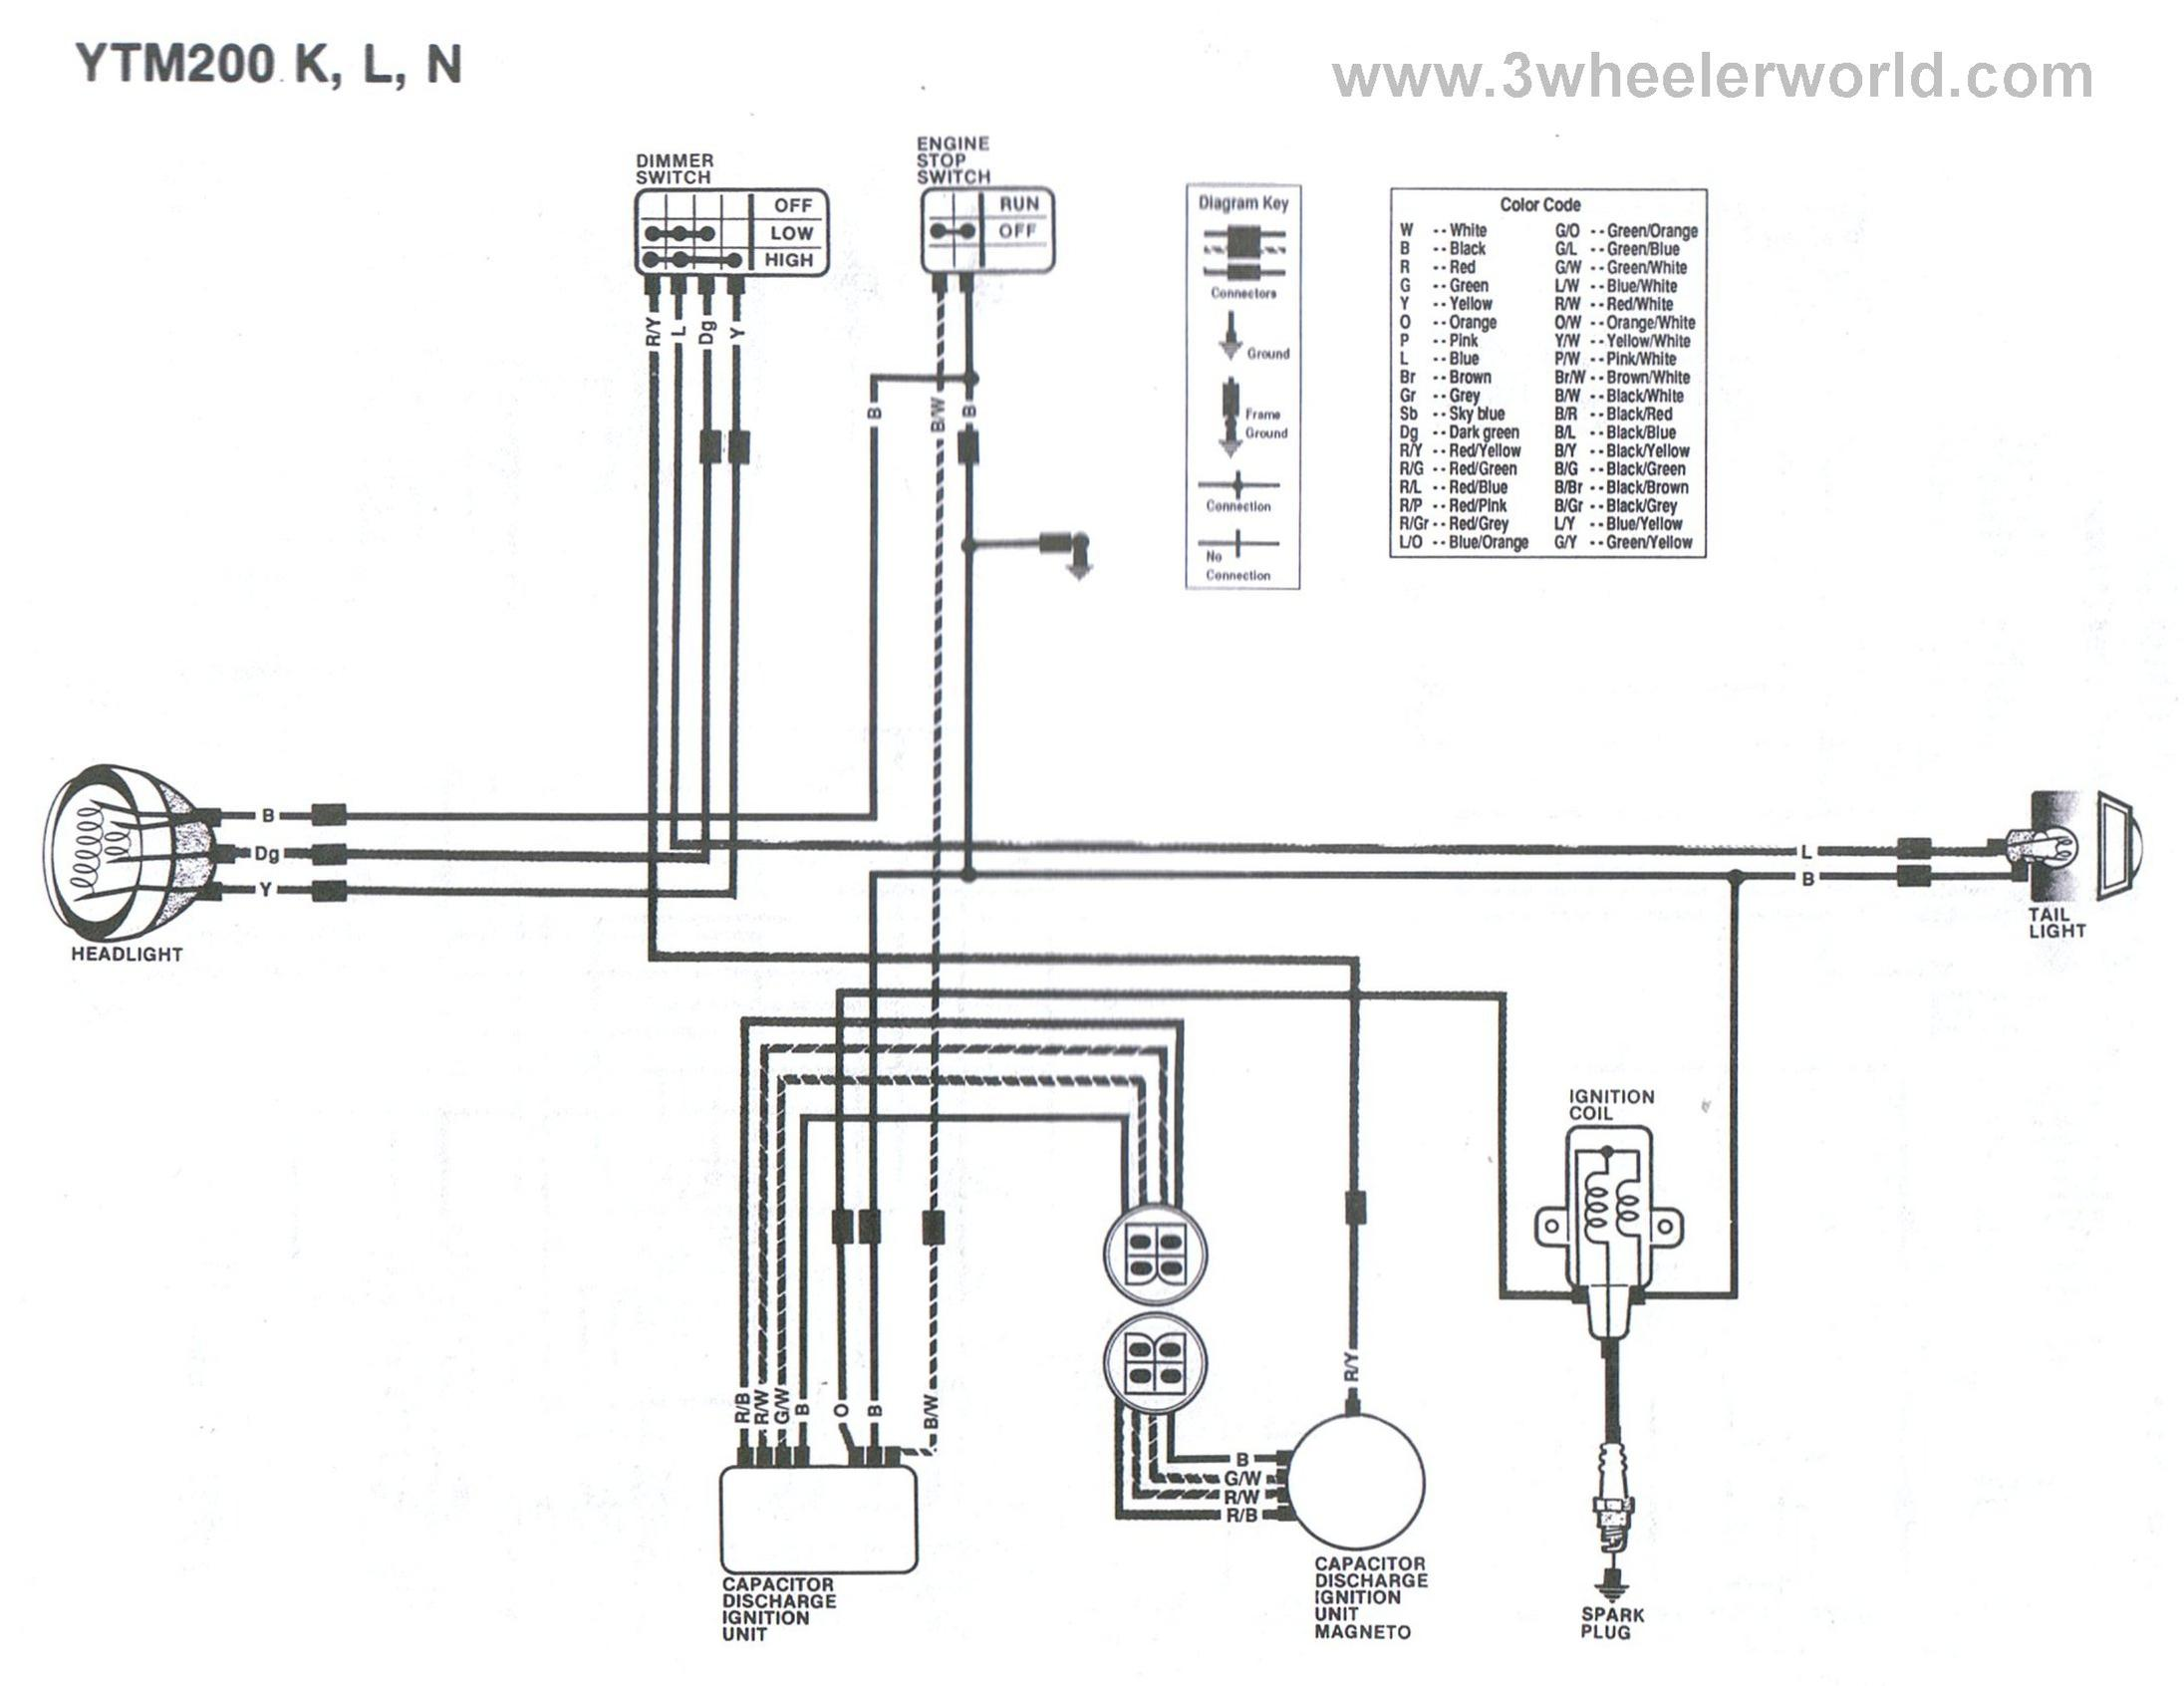 diagram] 1980 3 wheeler wiring diagram - cacbi.infinityagespa.it  infinity age spa